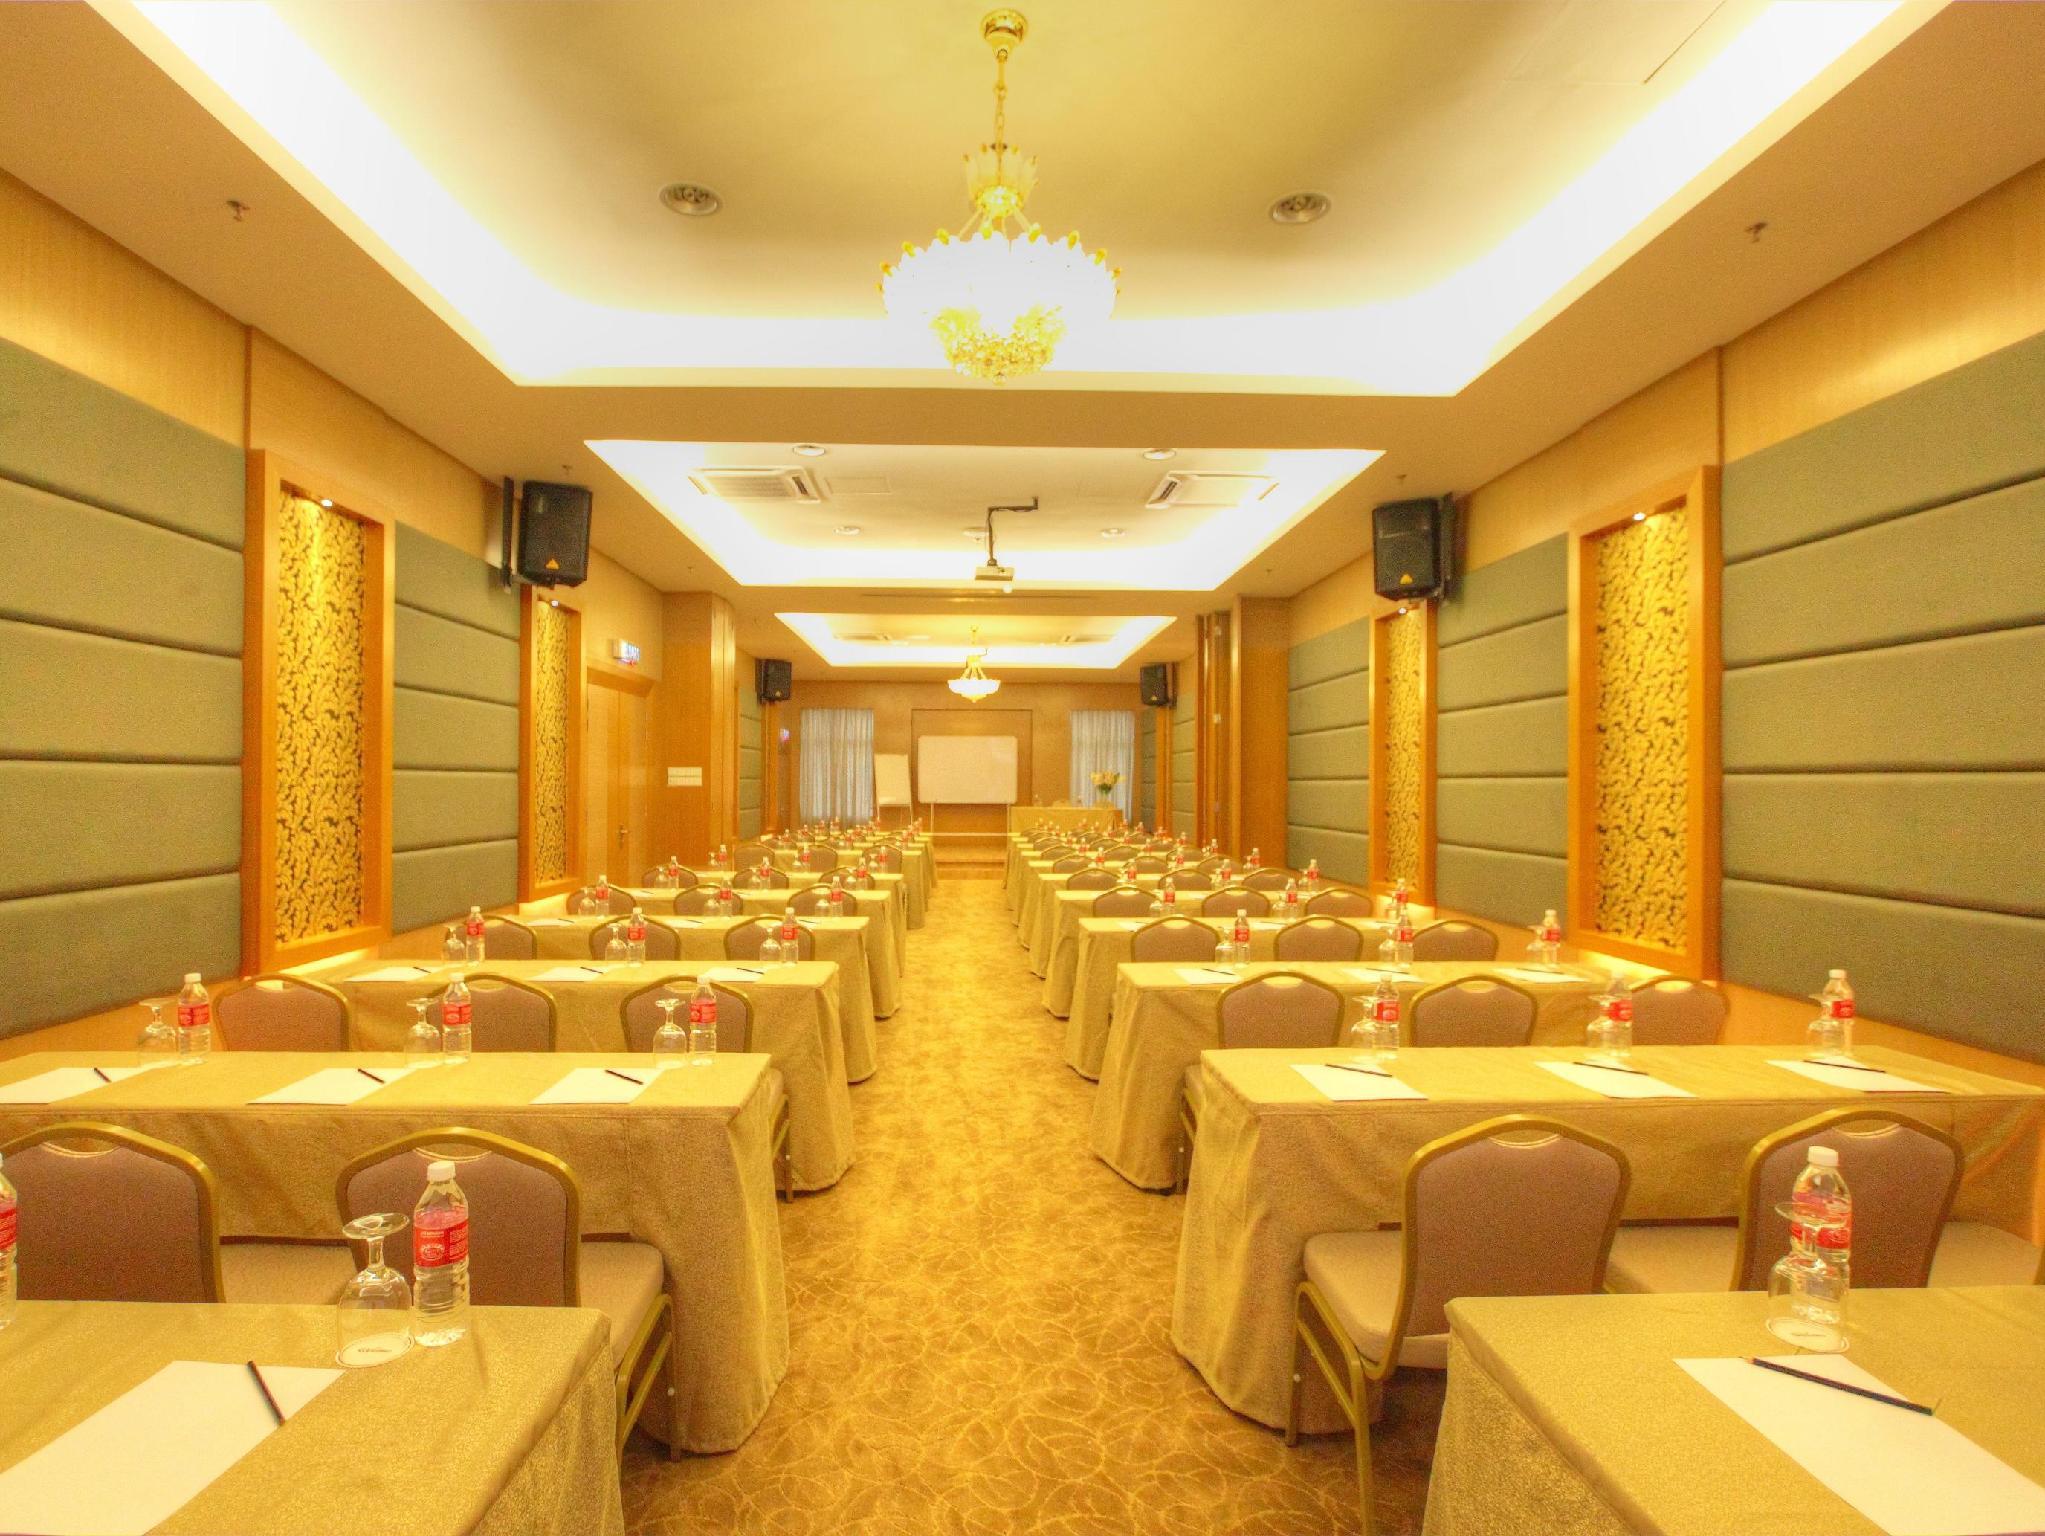 Lokasi The Guest Hotel & Spa PT 4704, Jalan DS 3/1, Bandar Dataran Segar, Lukut,